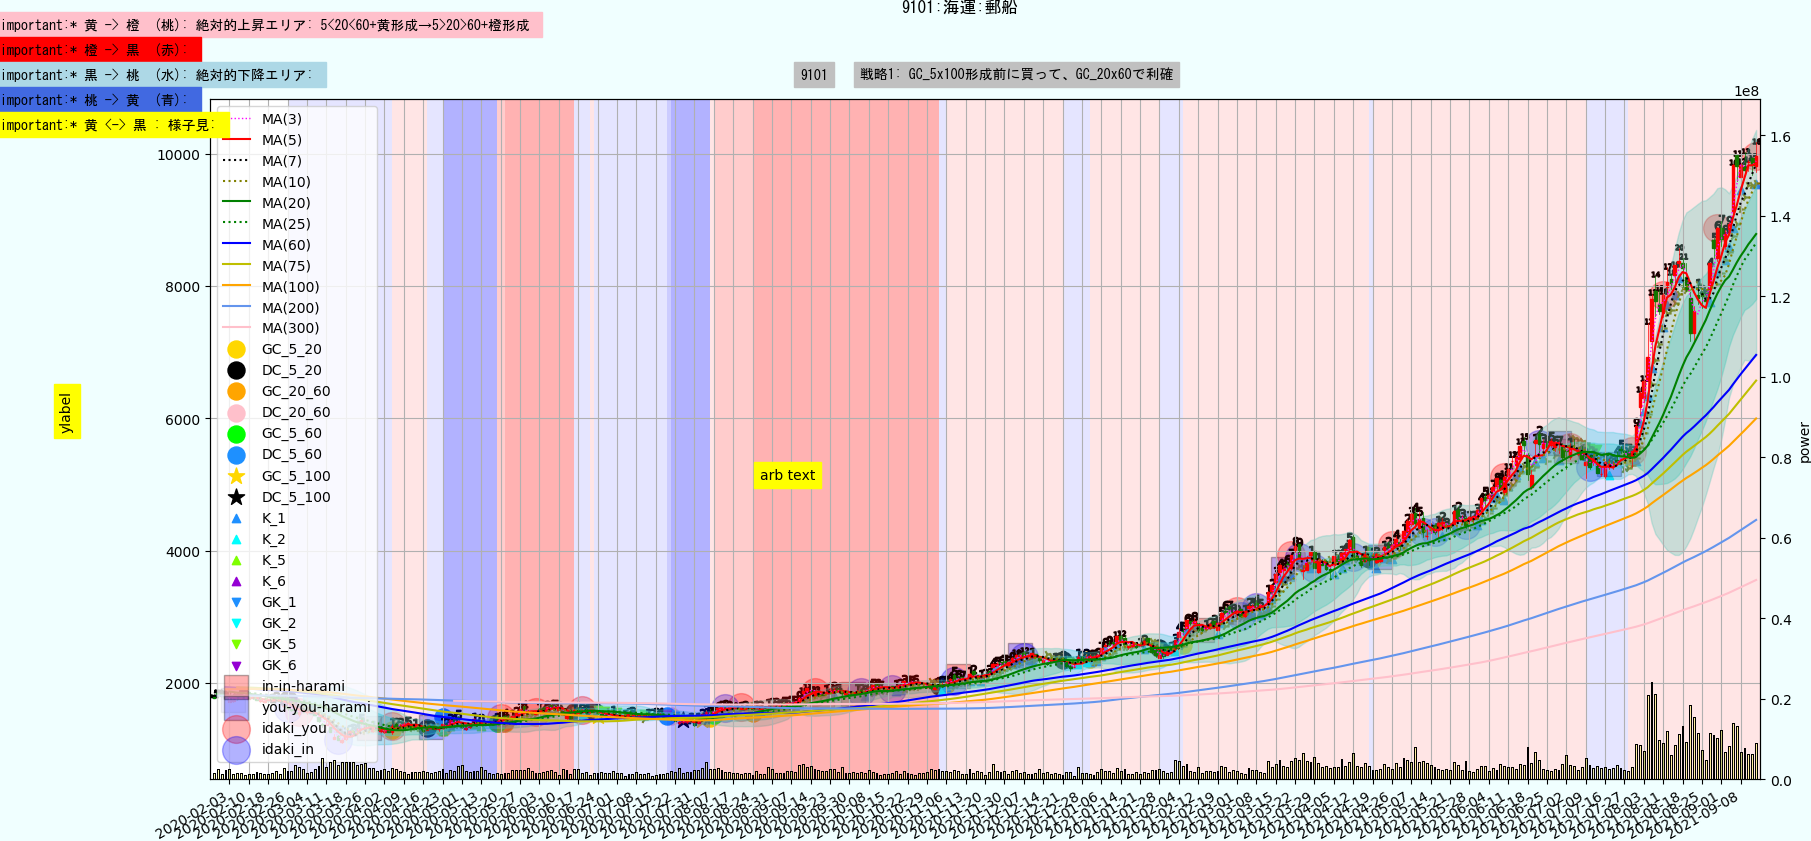 https://trident-capital-strage.s3.ap-northeast-1.amazonaws.com/charts/20210914/9101.png